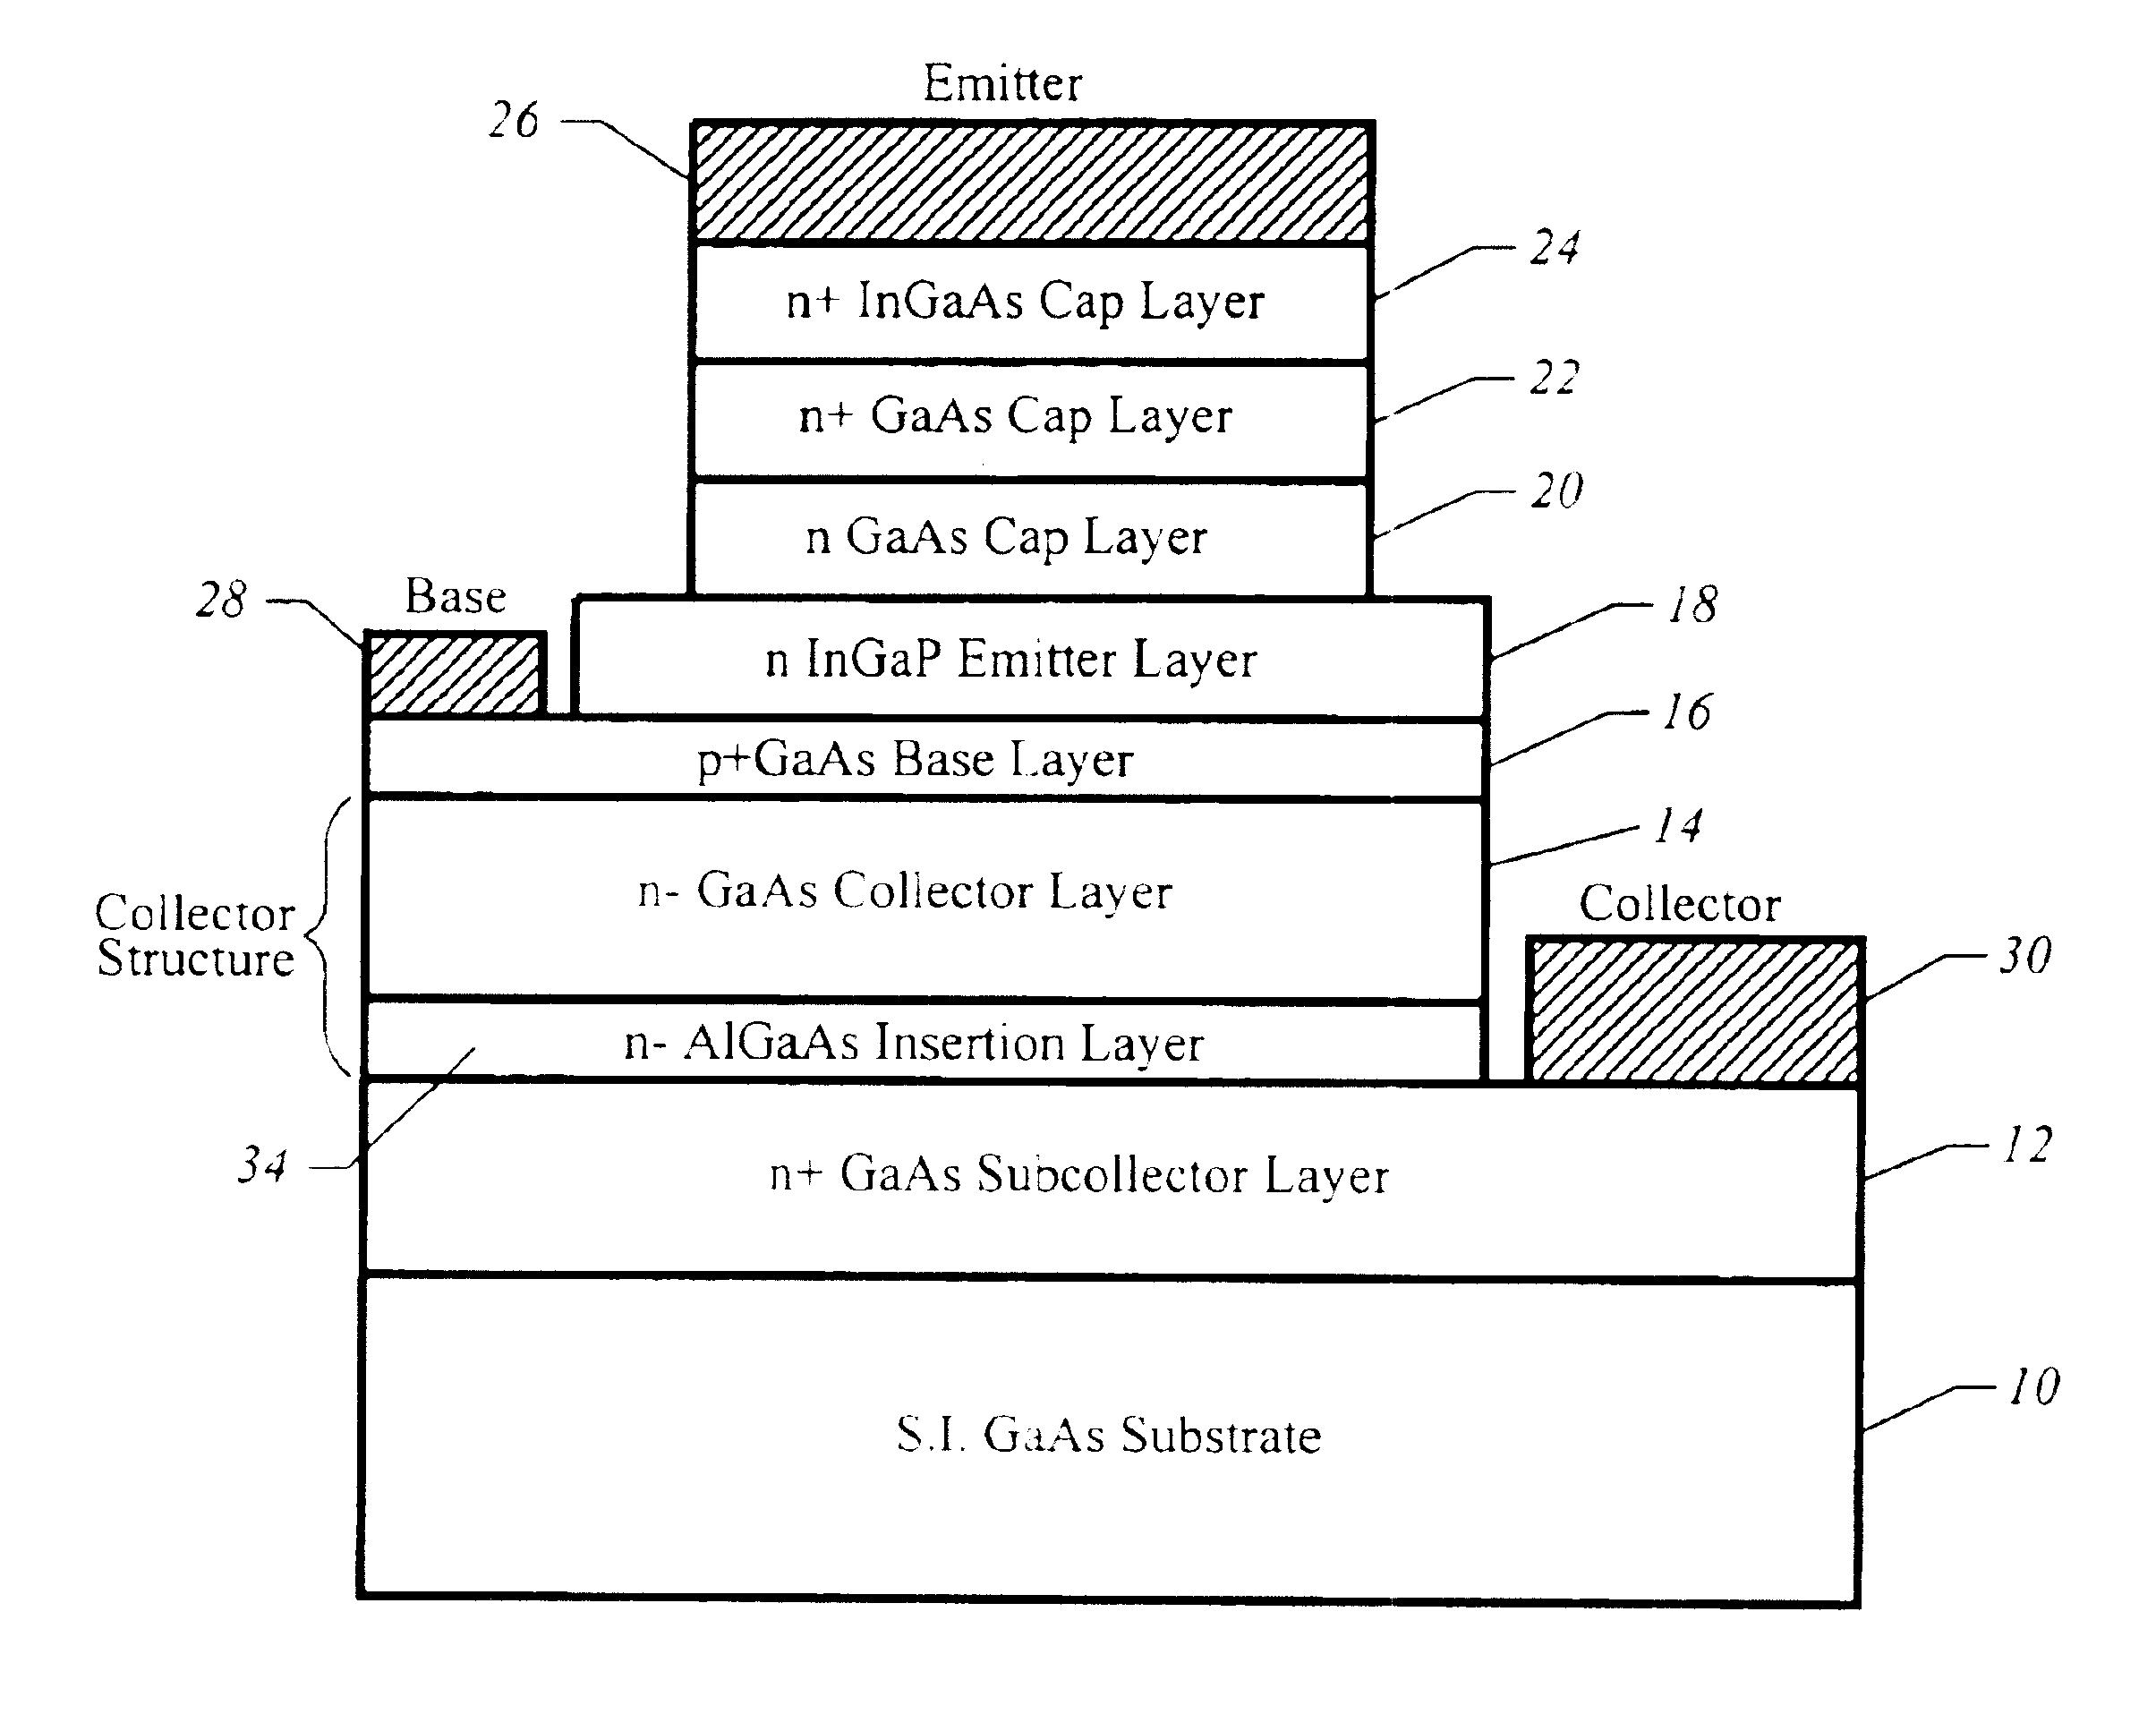 patent us6806513 - heterojunction bipolar transistor having wide bandgap  material in collector - google patents